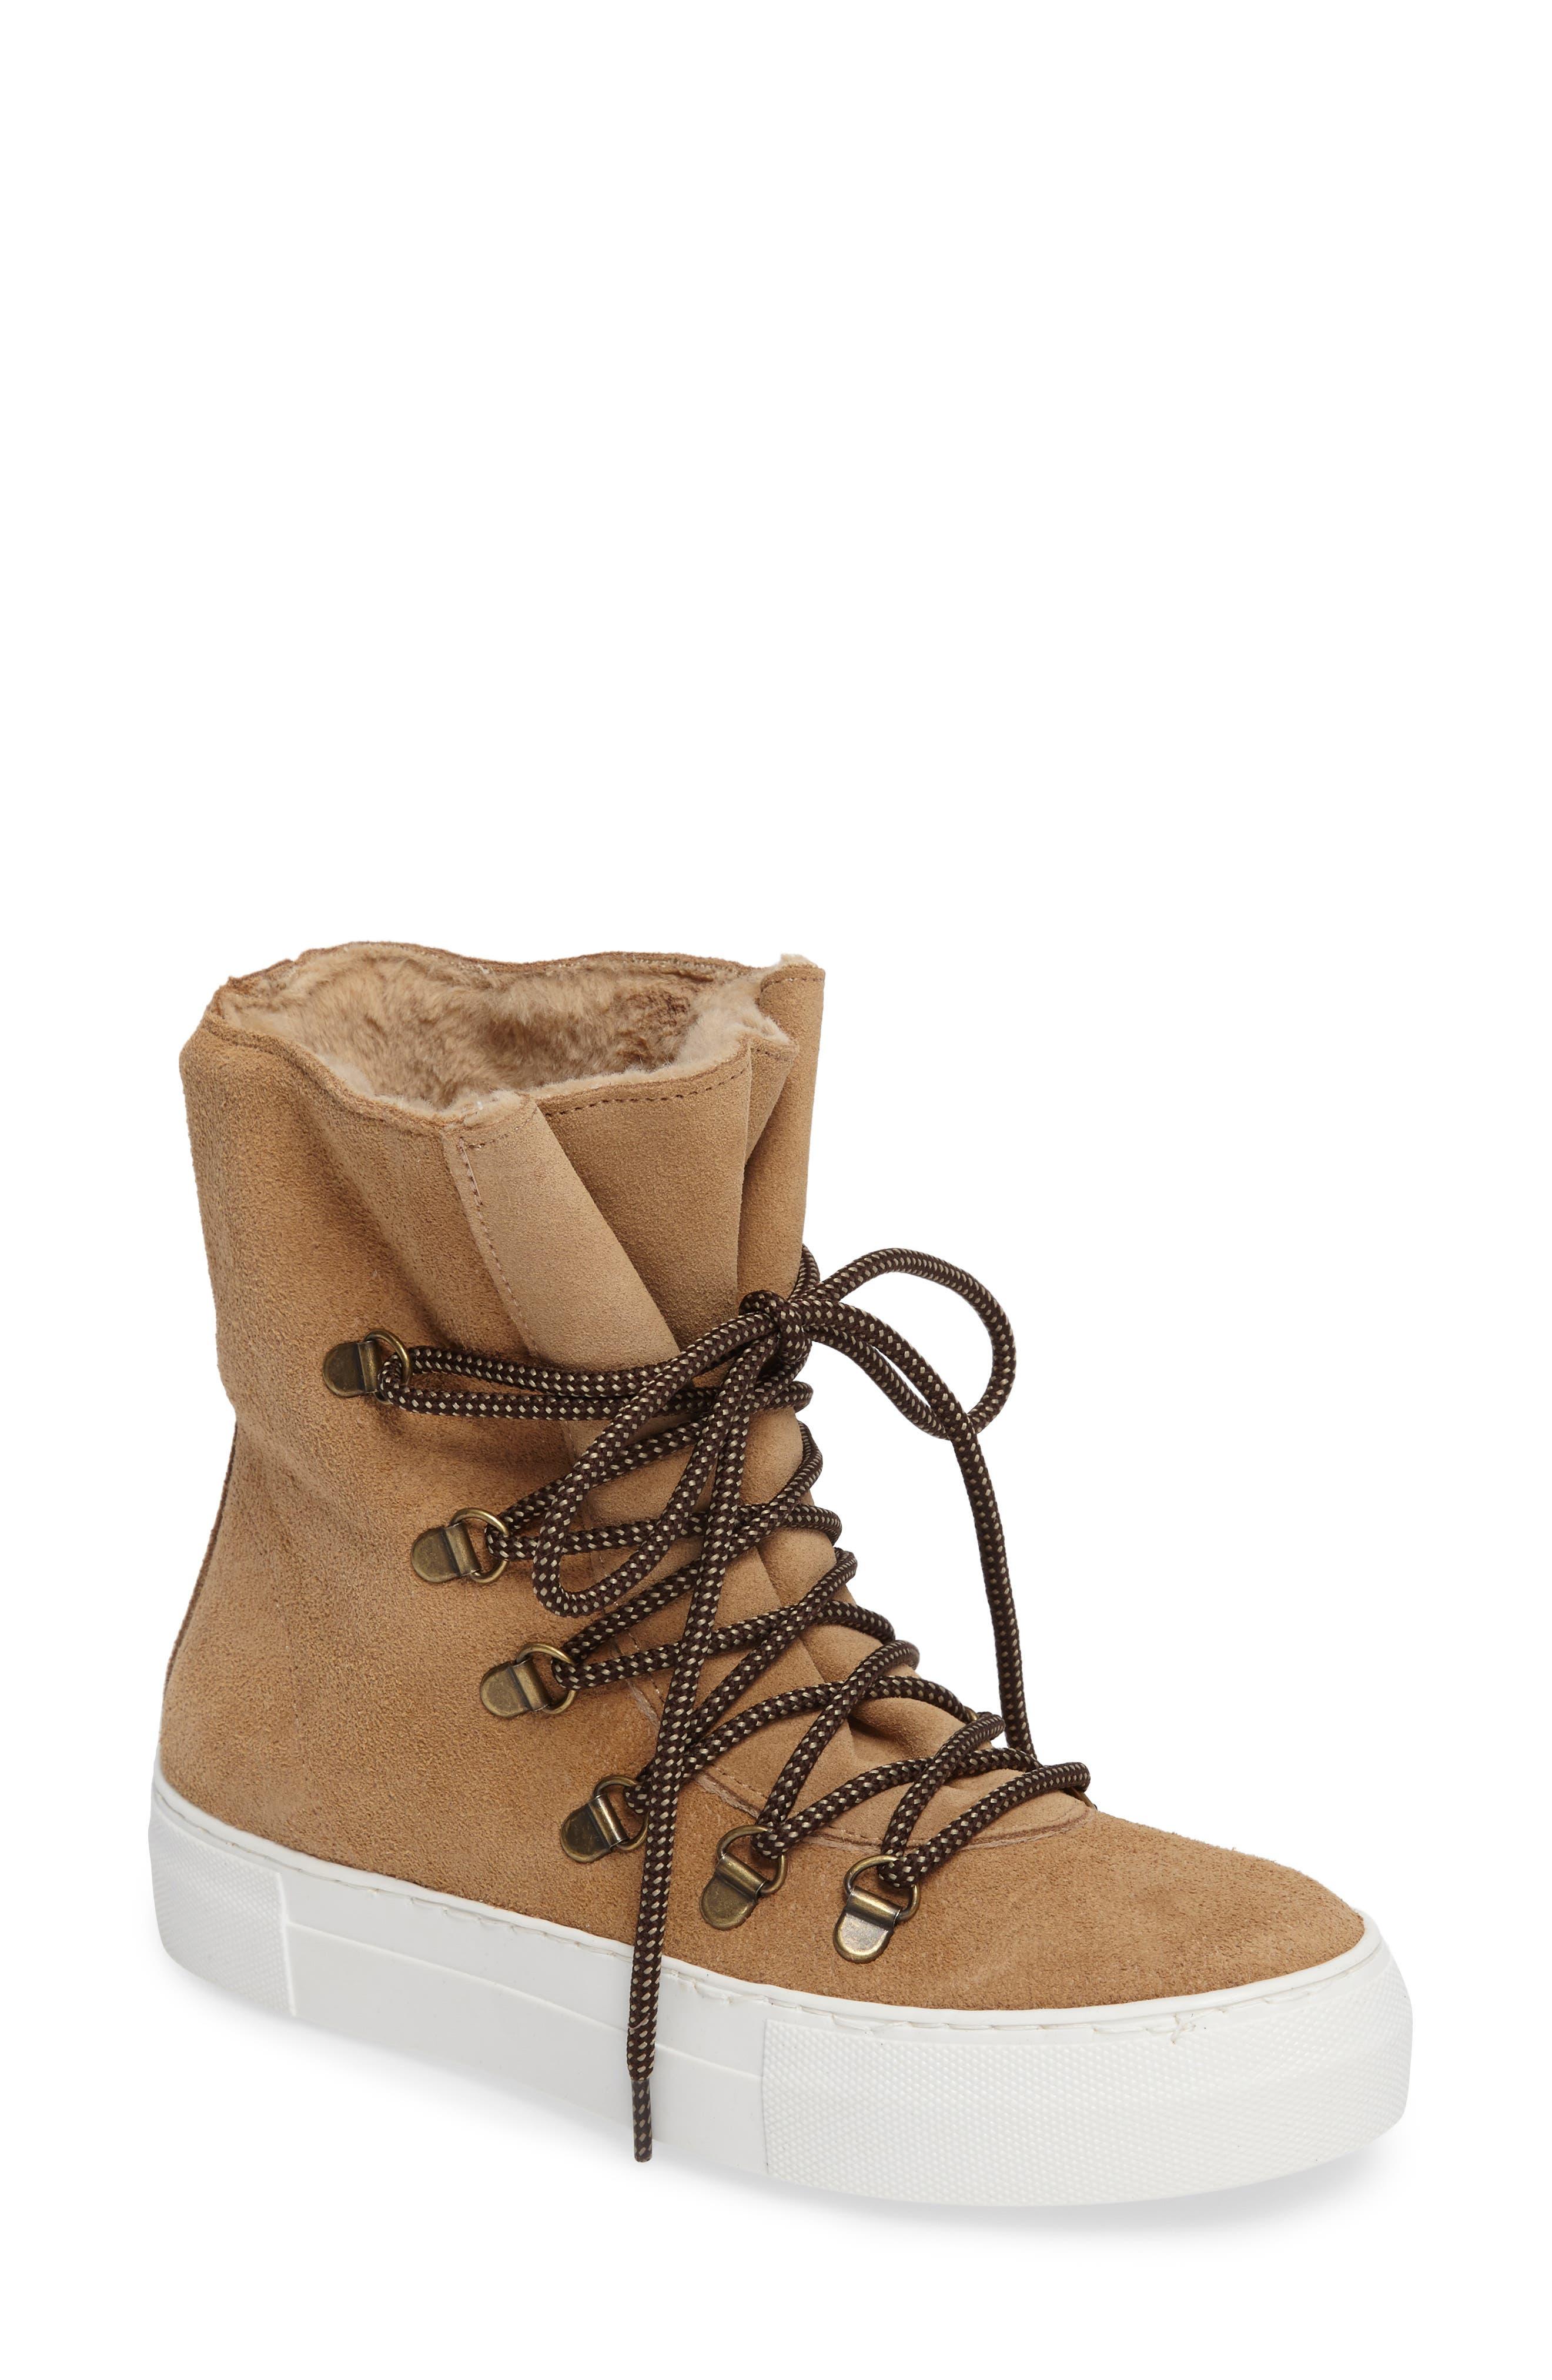 Cimone High Top Sneaker,                             Main thumbnail 1, color,                             263